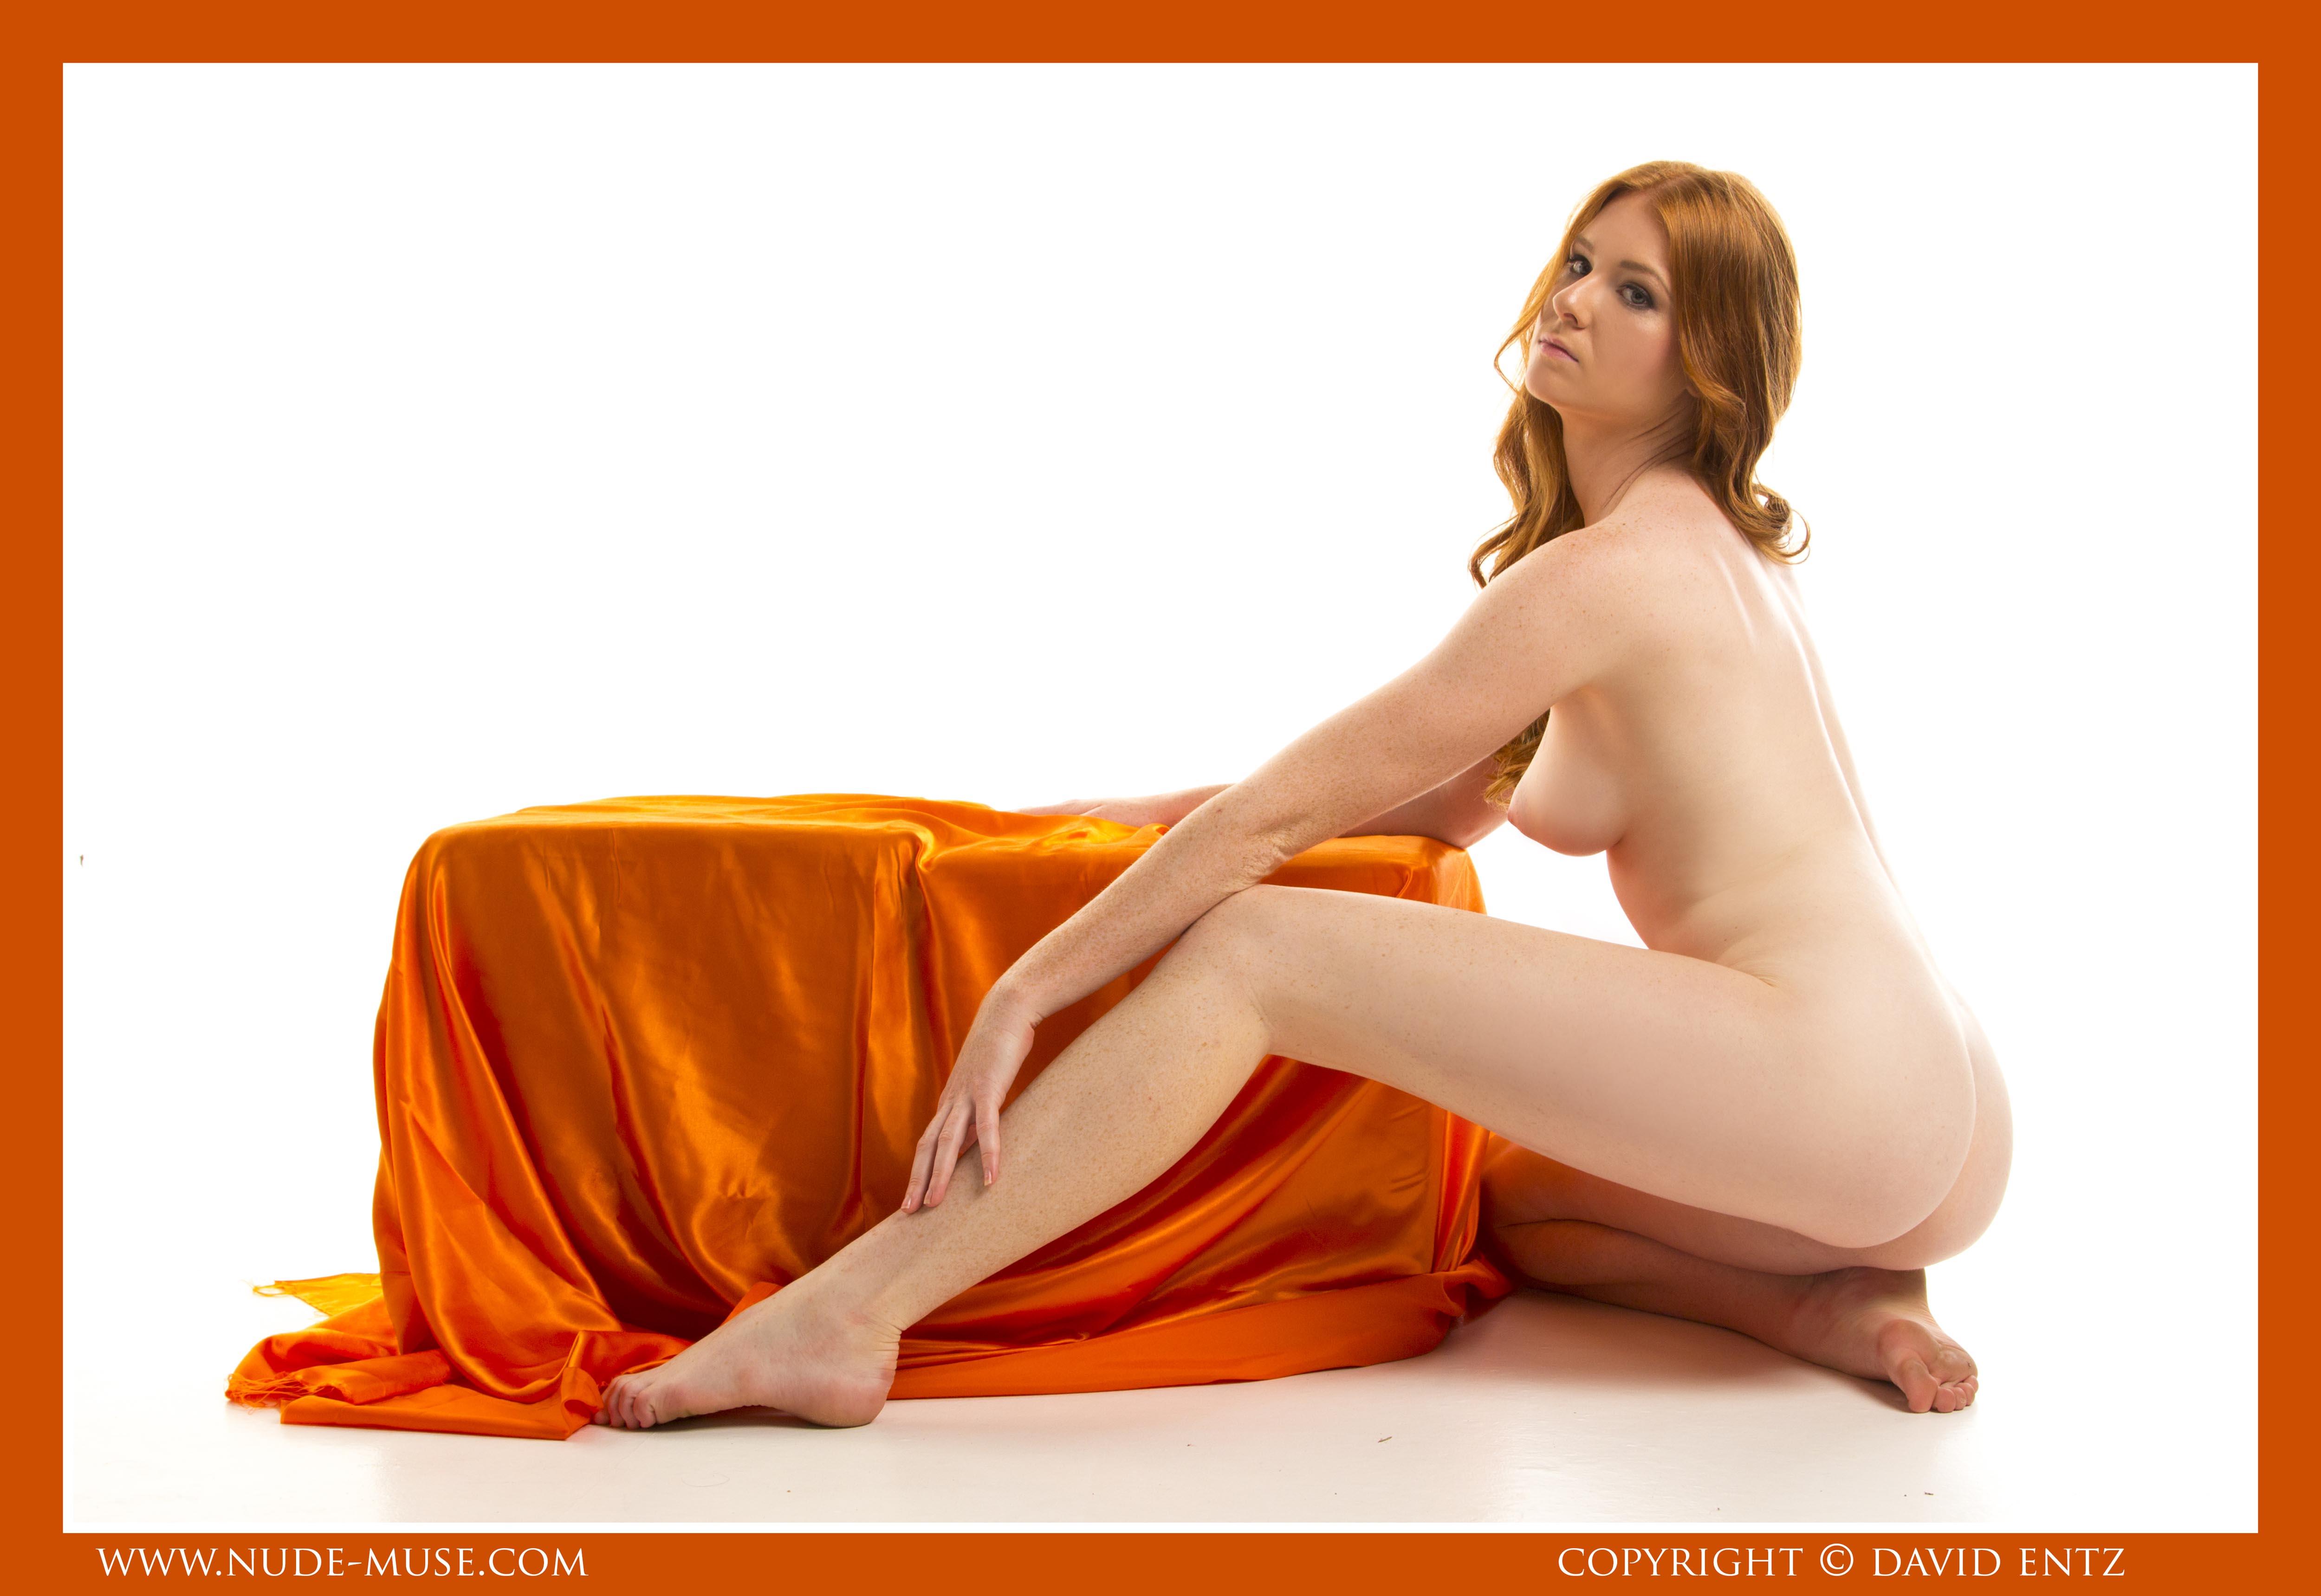 xena nude